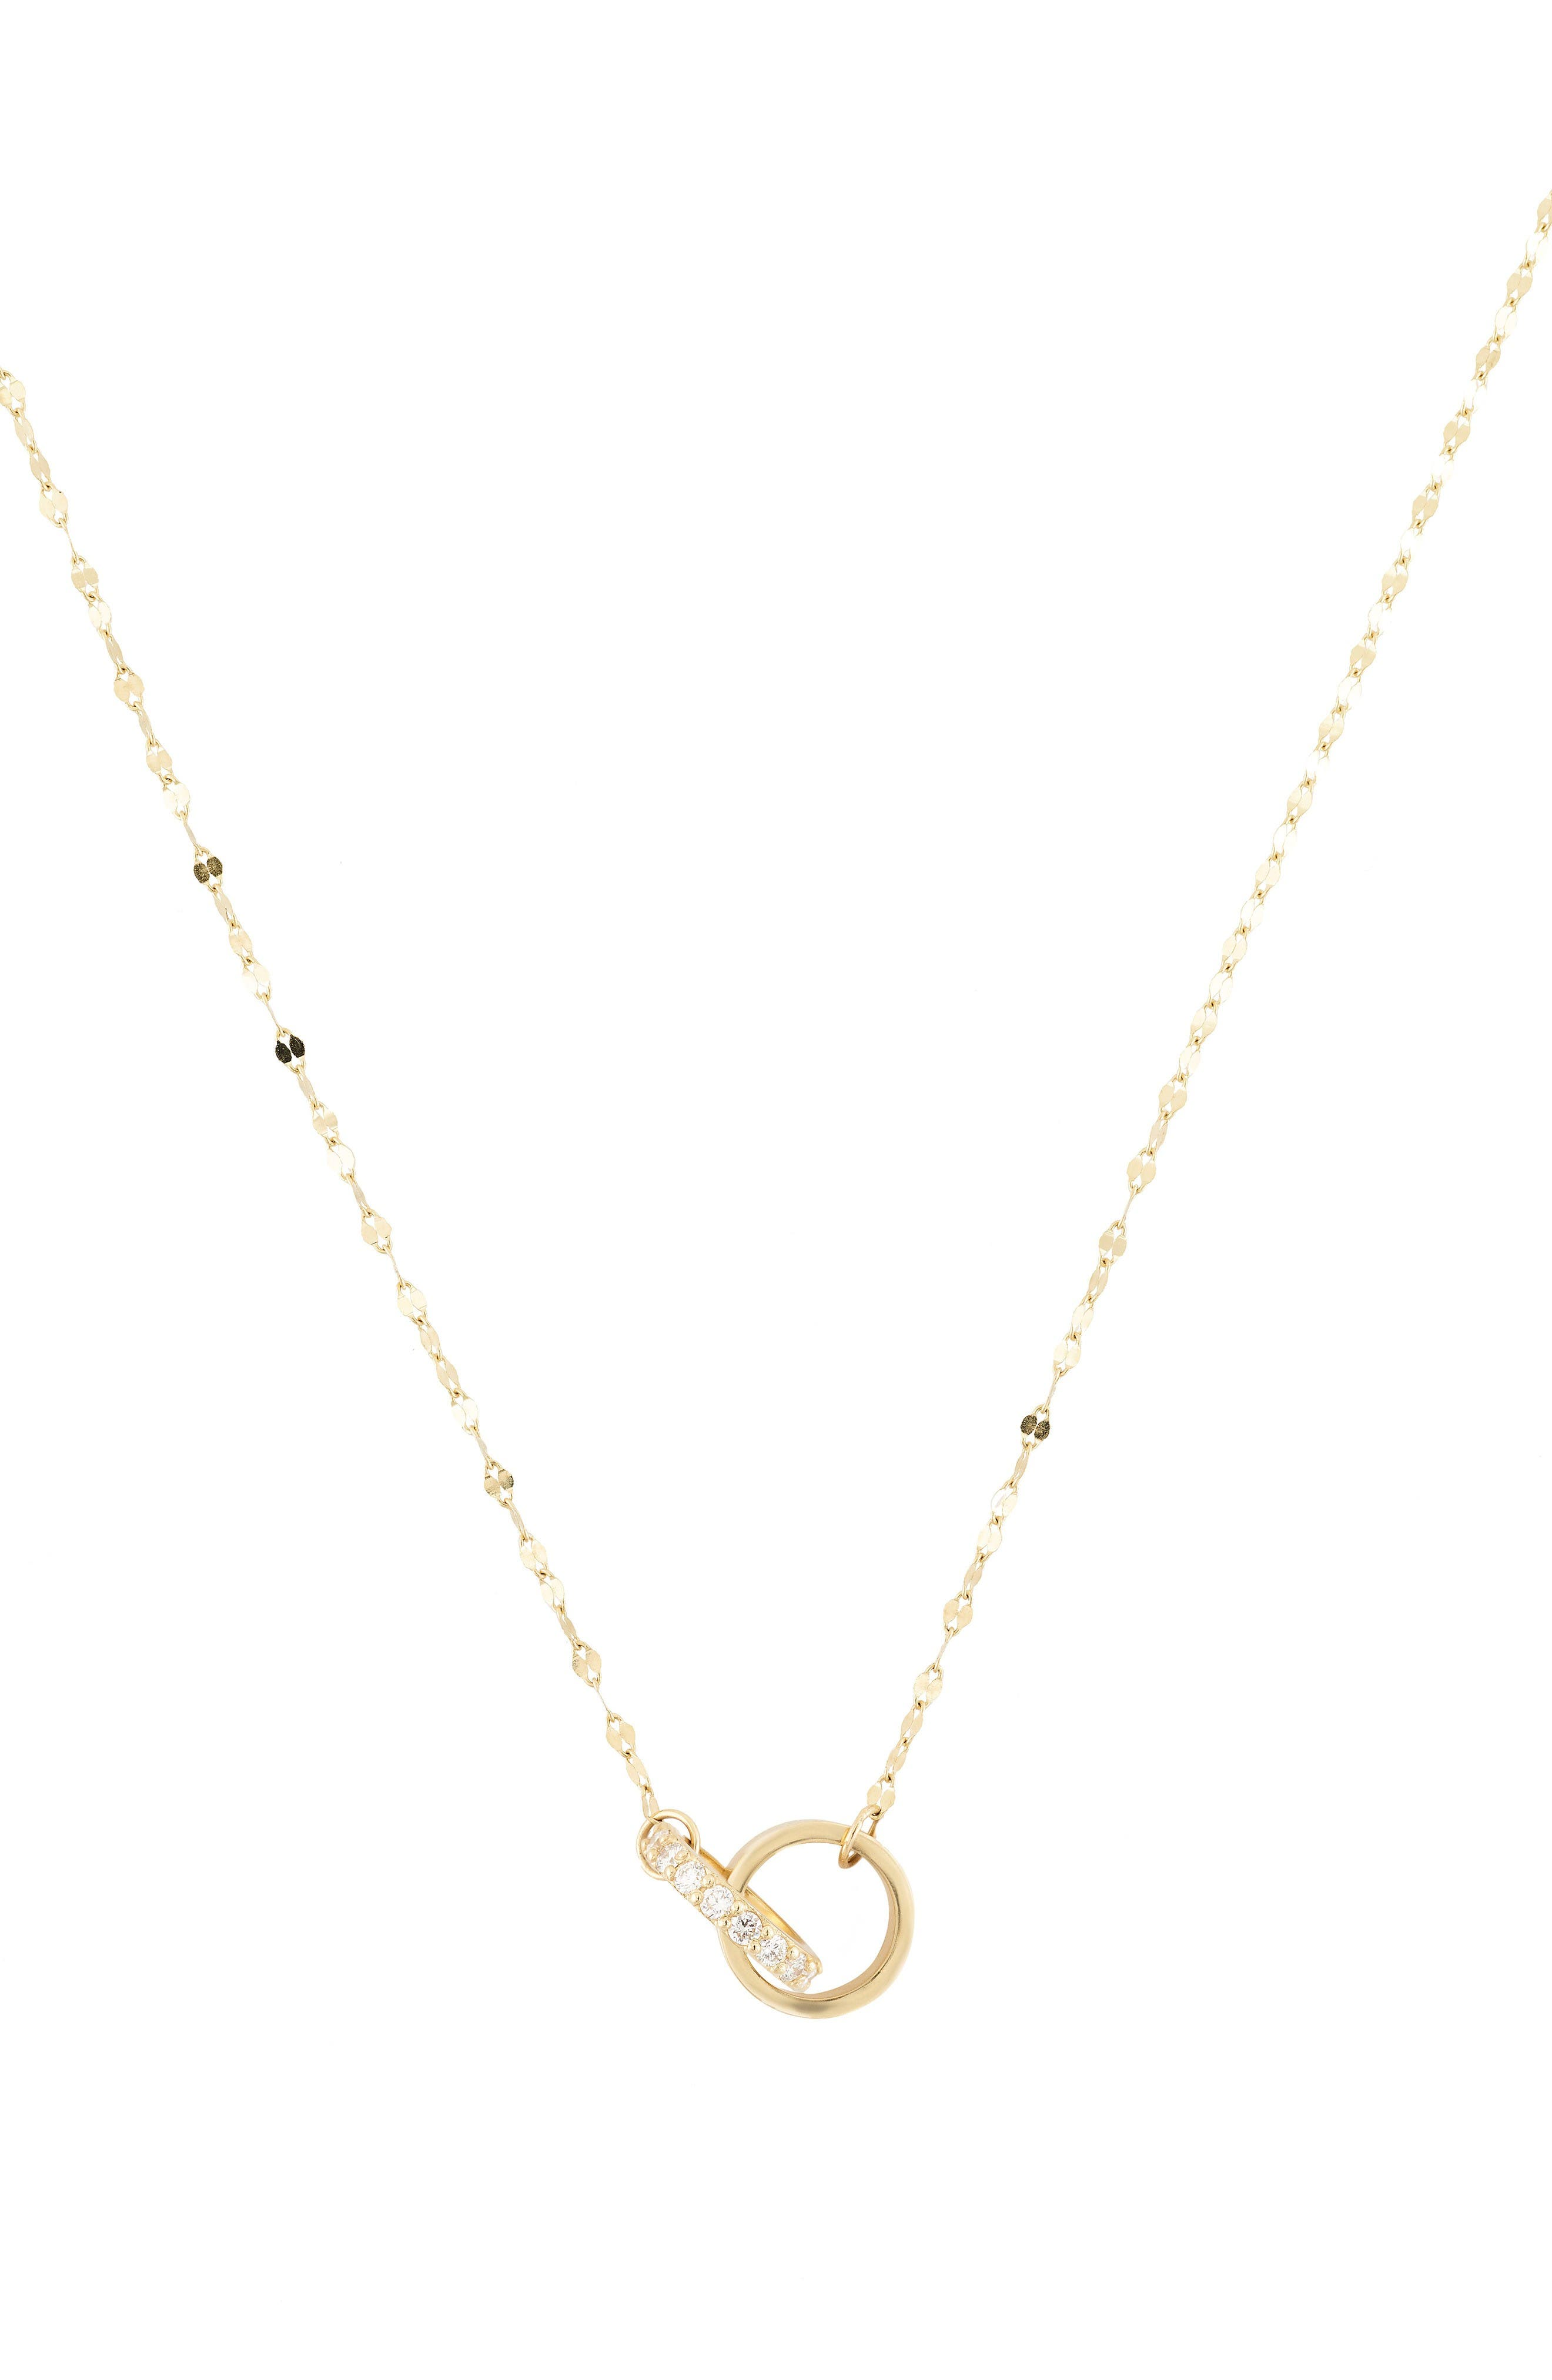 LANA JEWELRY Flawless Diamond Link Pendant Necklace